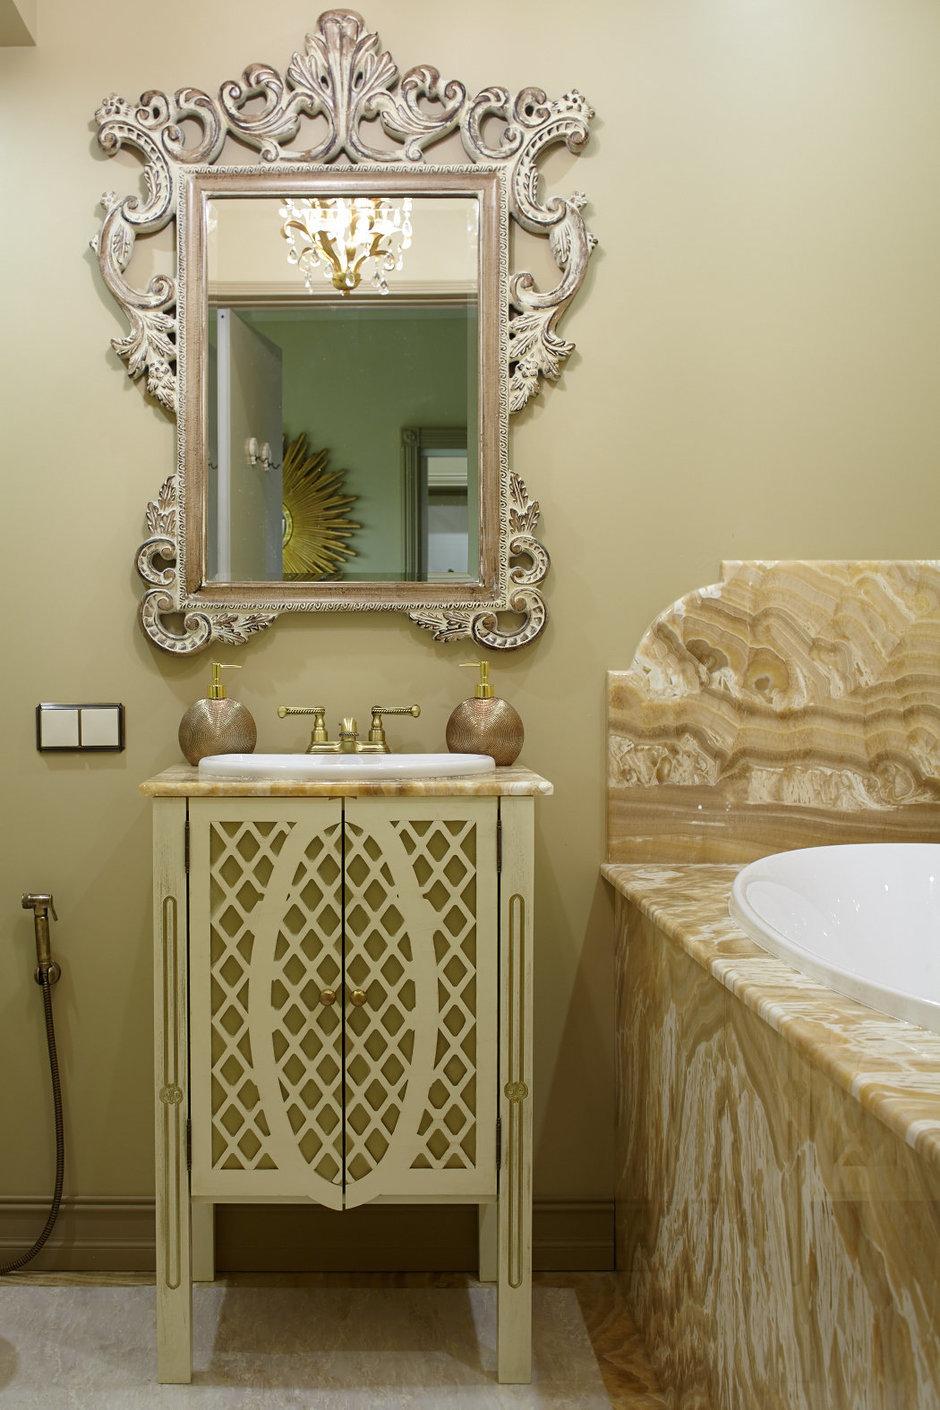 Фотография: Ванная в стиле , Классический, Эклектика, Квартира, Текстиль, Дома и квартиры – фото на InMyRoom.ru